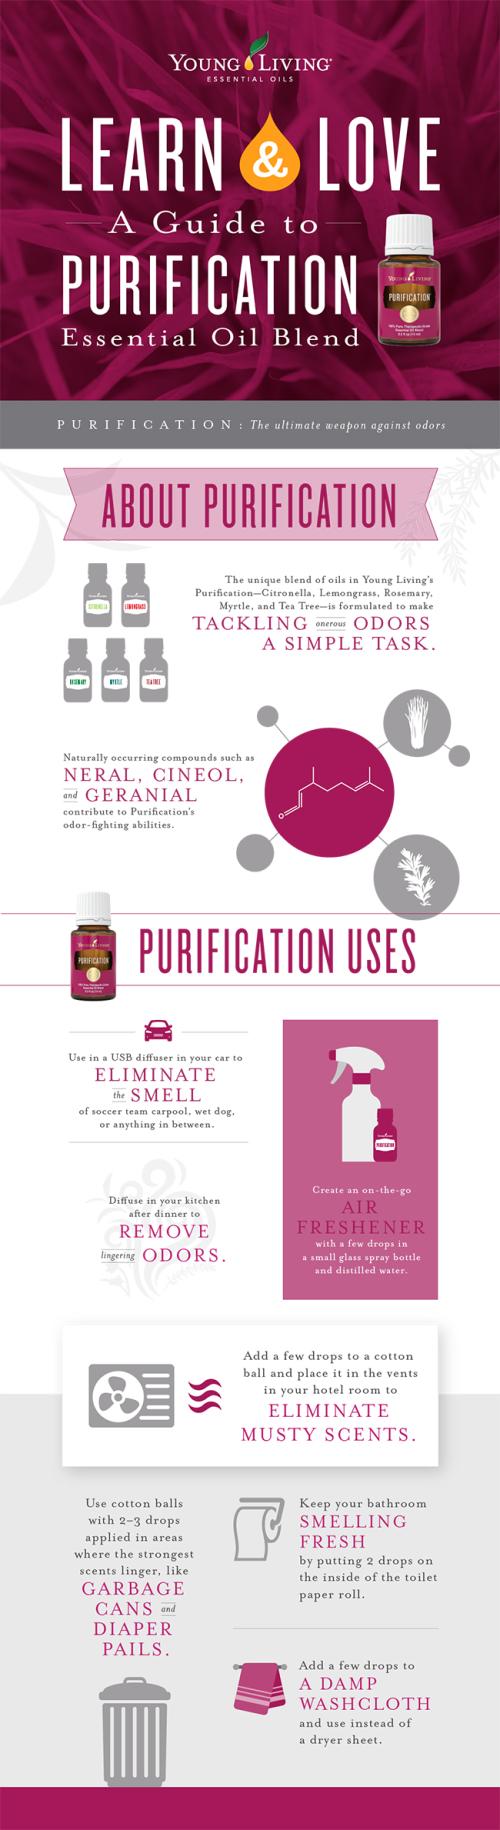 A-guide-to-Purification-essential-oil-blend www.EssentialOils4Sale.com